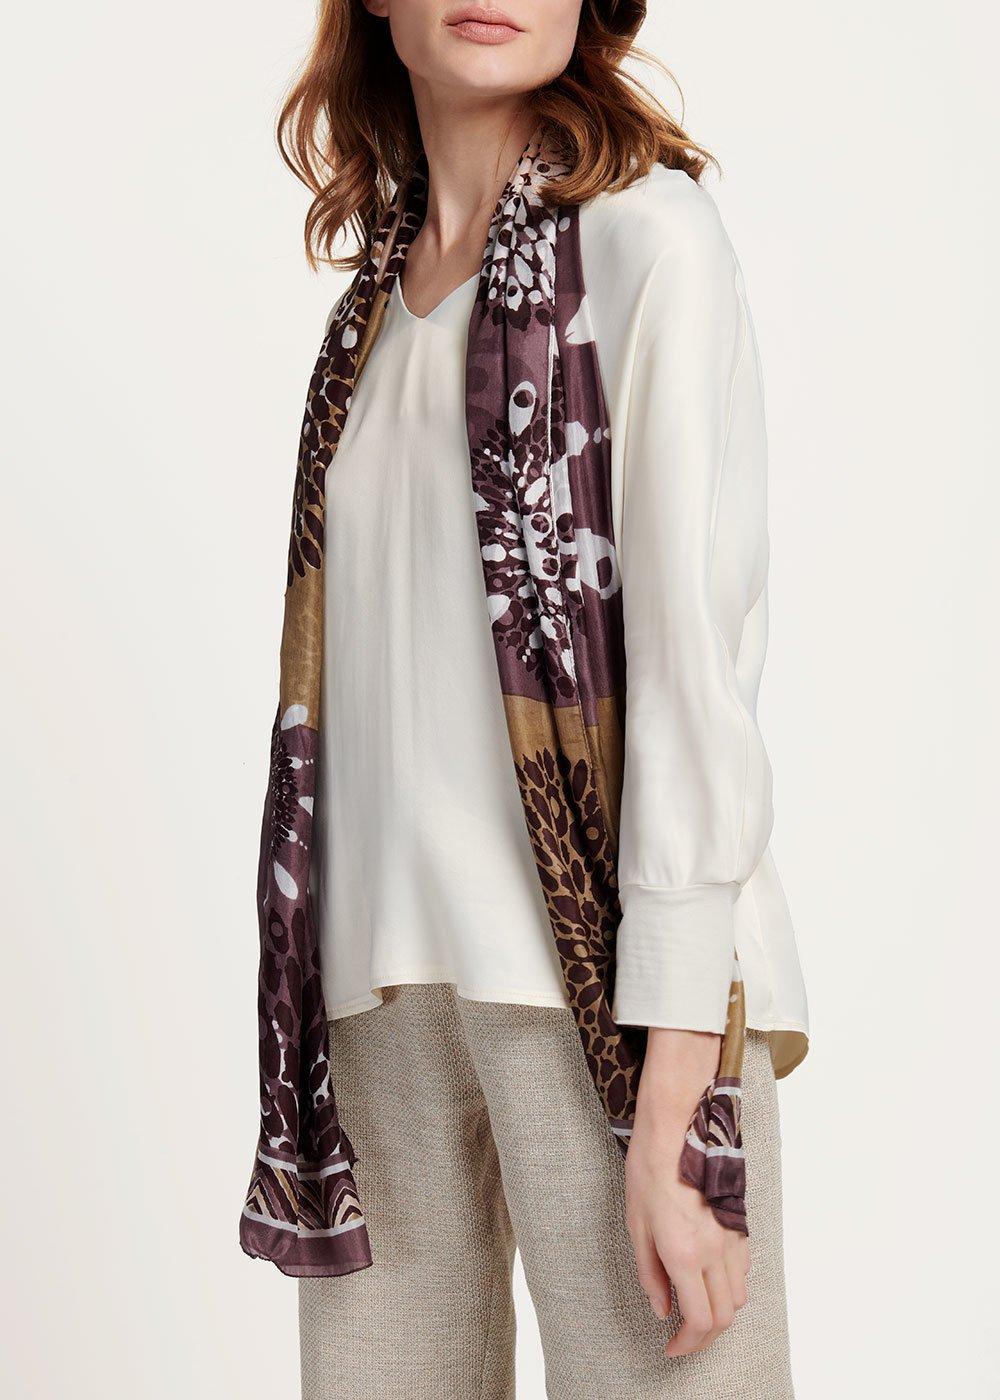 Sail scarf with flower print - Maracuja / Desert Fantasia - Woman